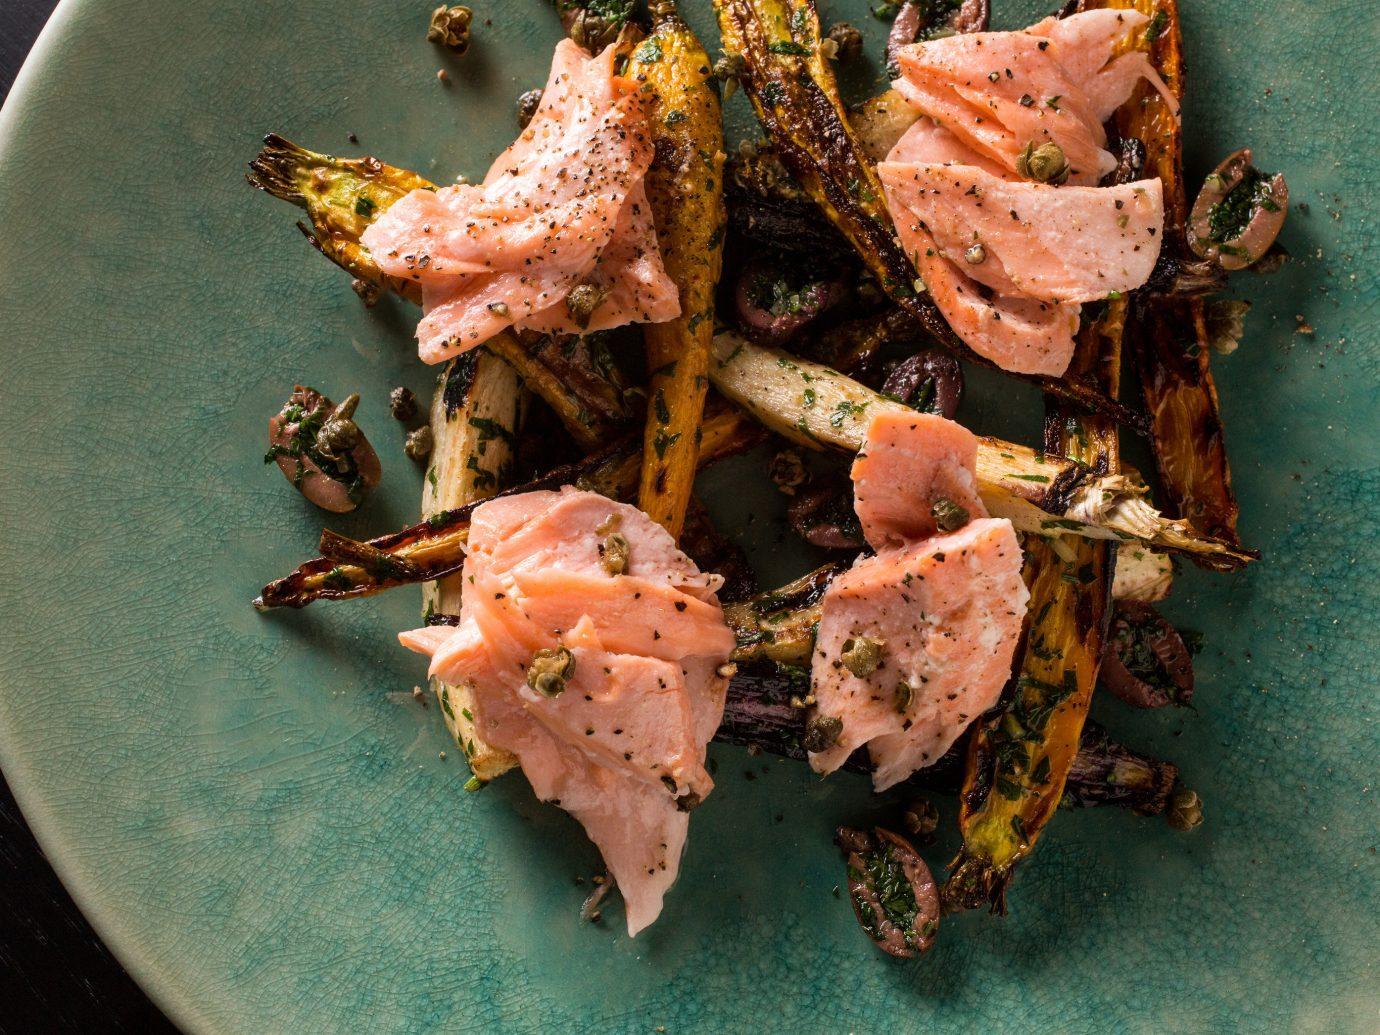 Food + Drink plate dish food Seafood meat animal source foods recipe meal